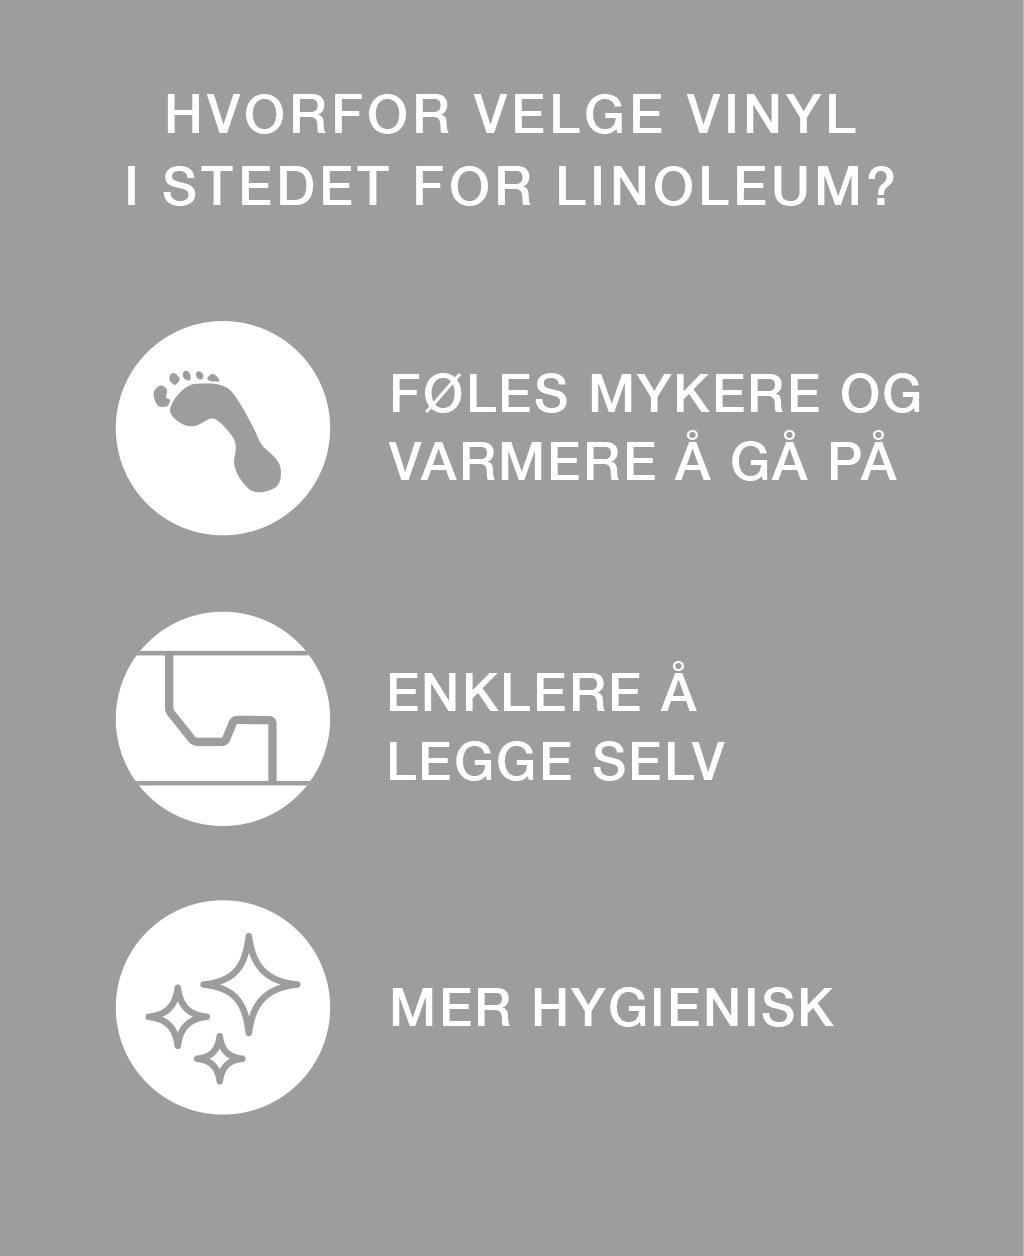 pergo-infographic-velg-vinylgulv-i-stedet-for-linoleumsgulv